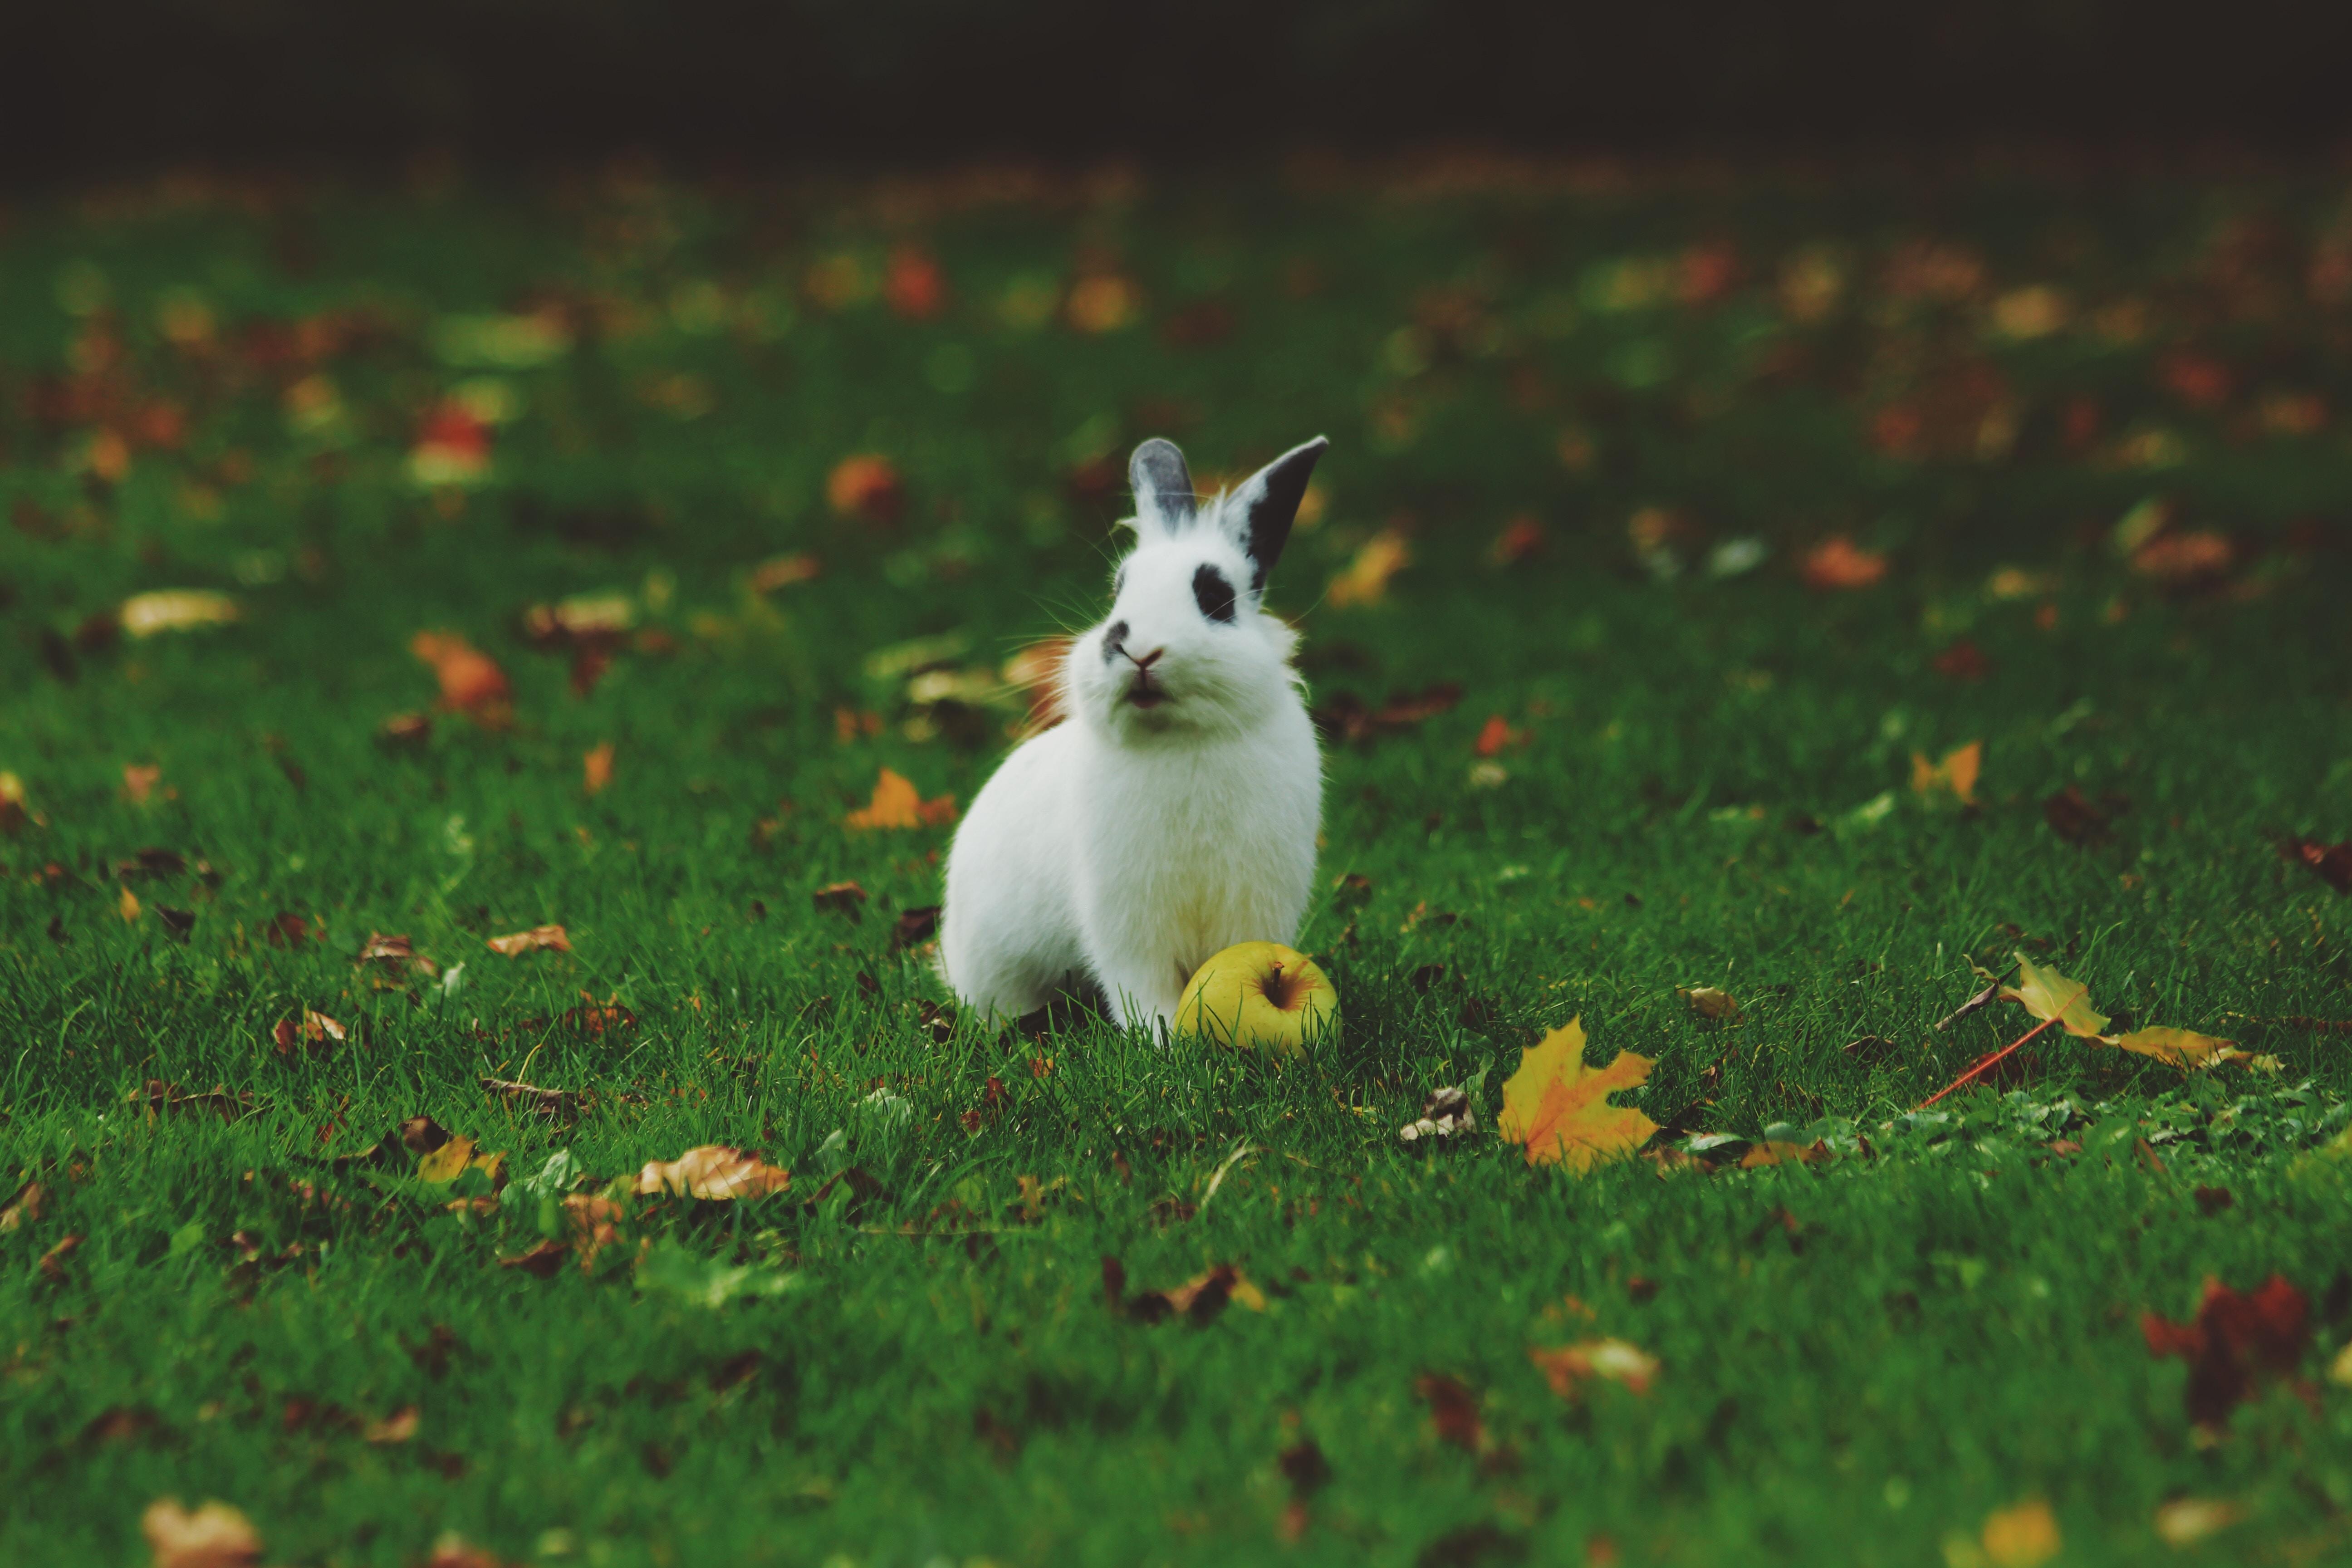 white rabbit standing on grass